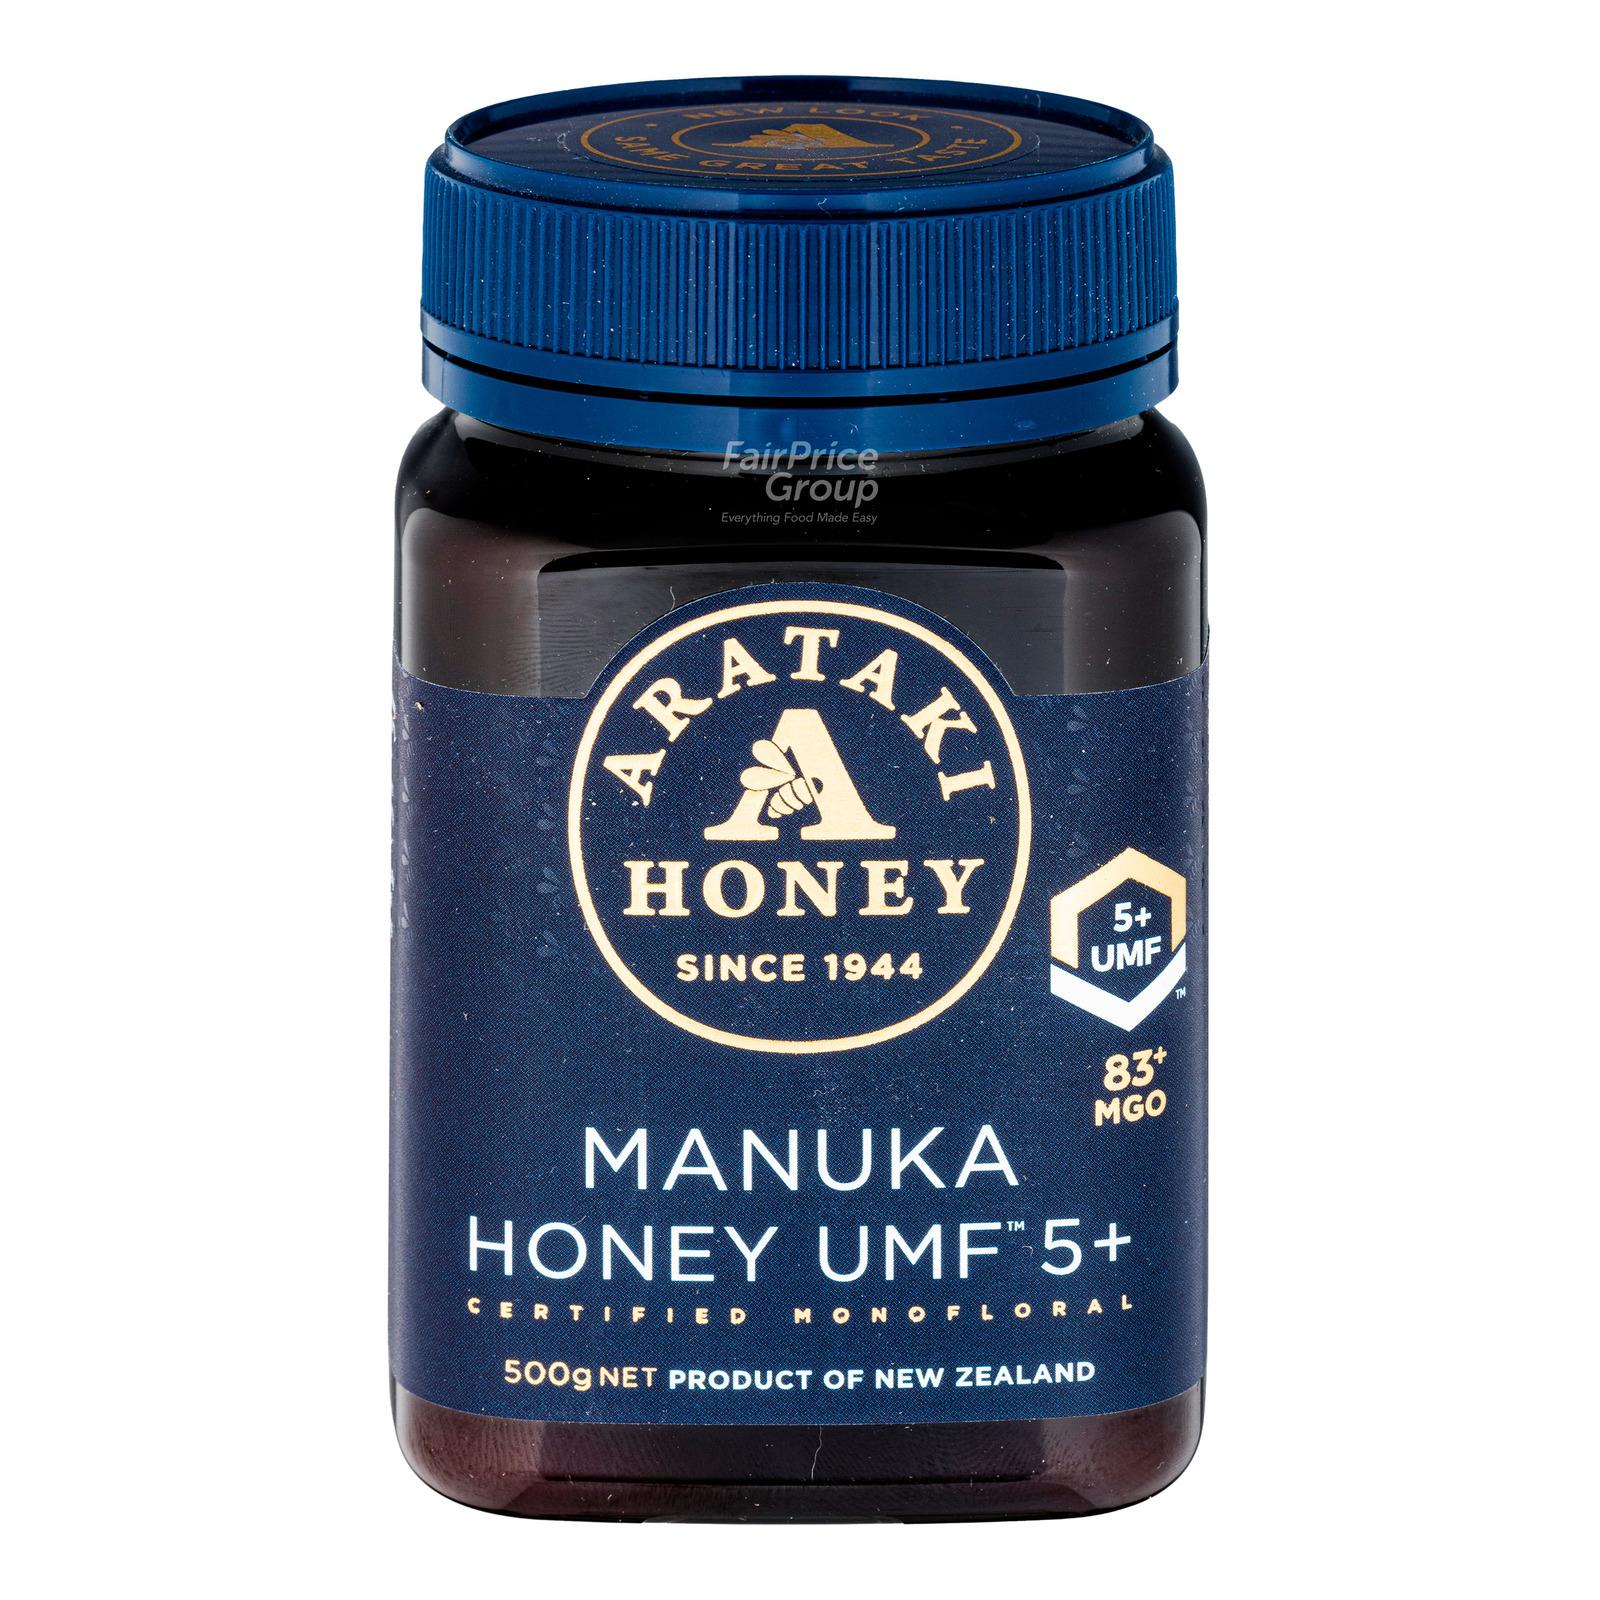 Arataki Honey - Manuka UMF5+